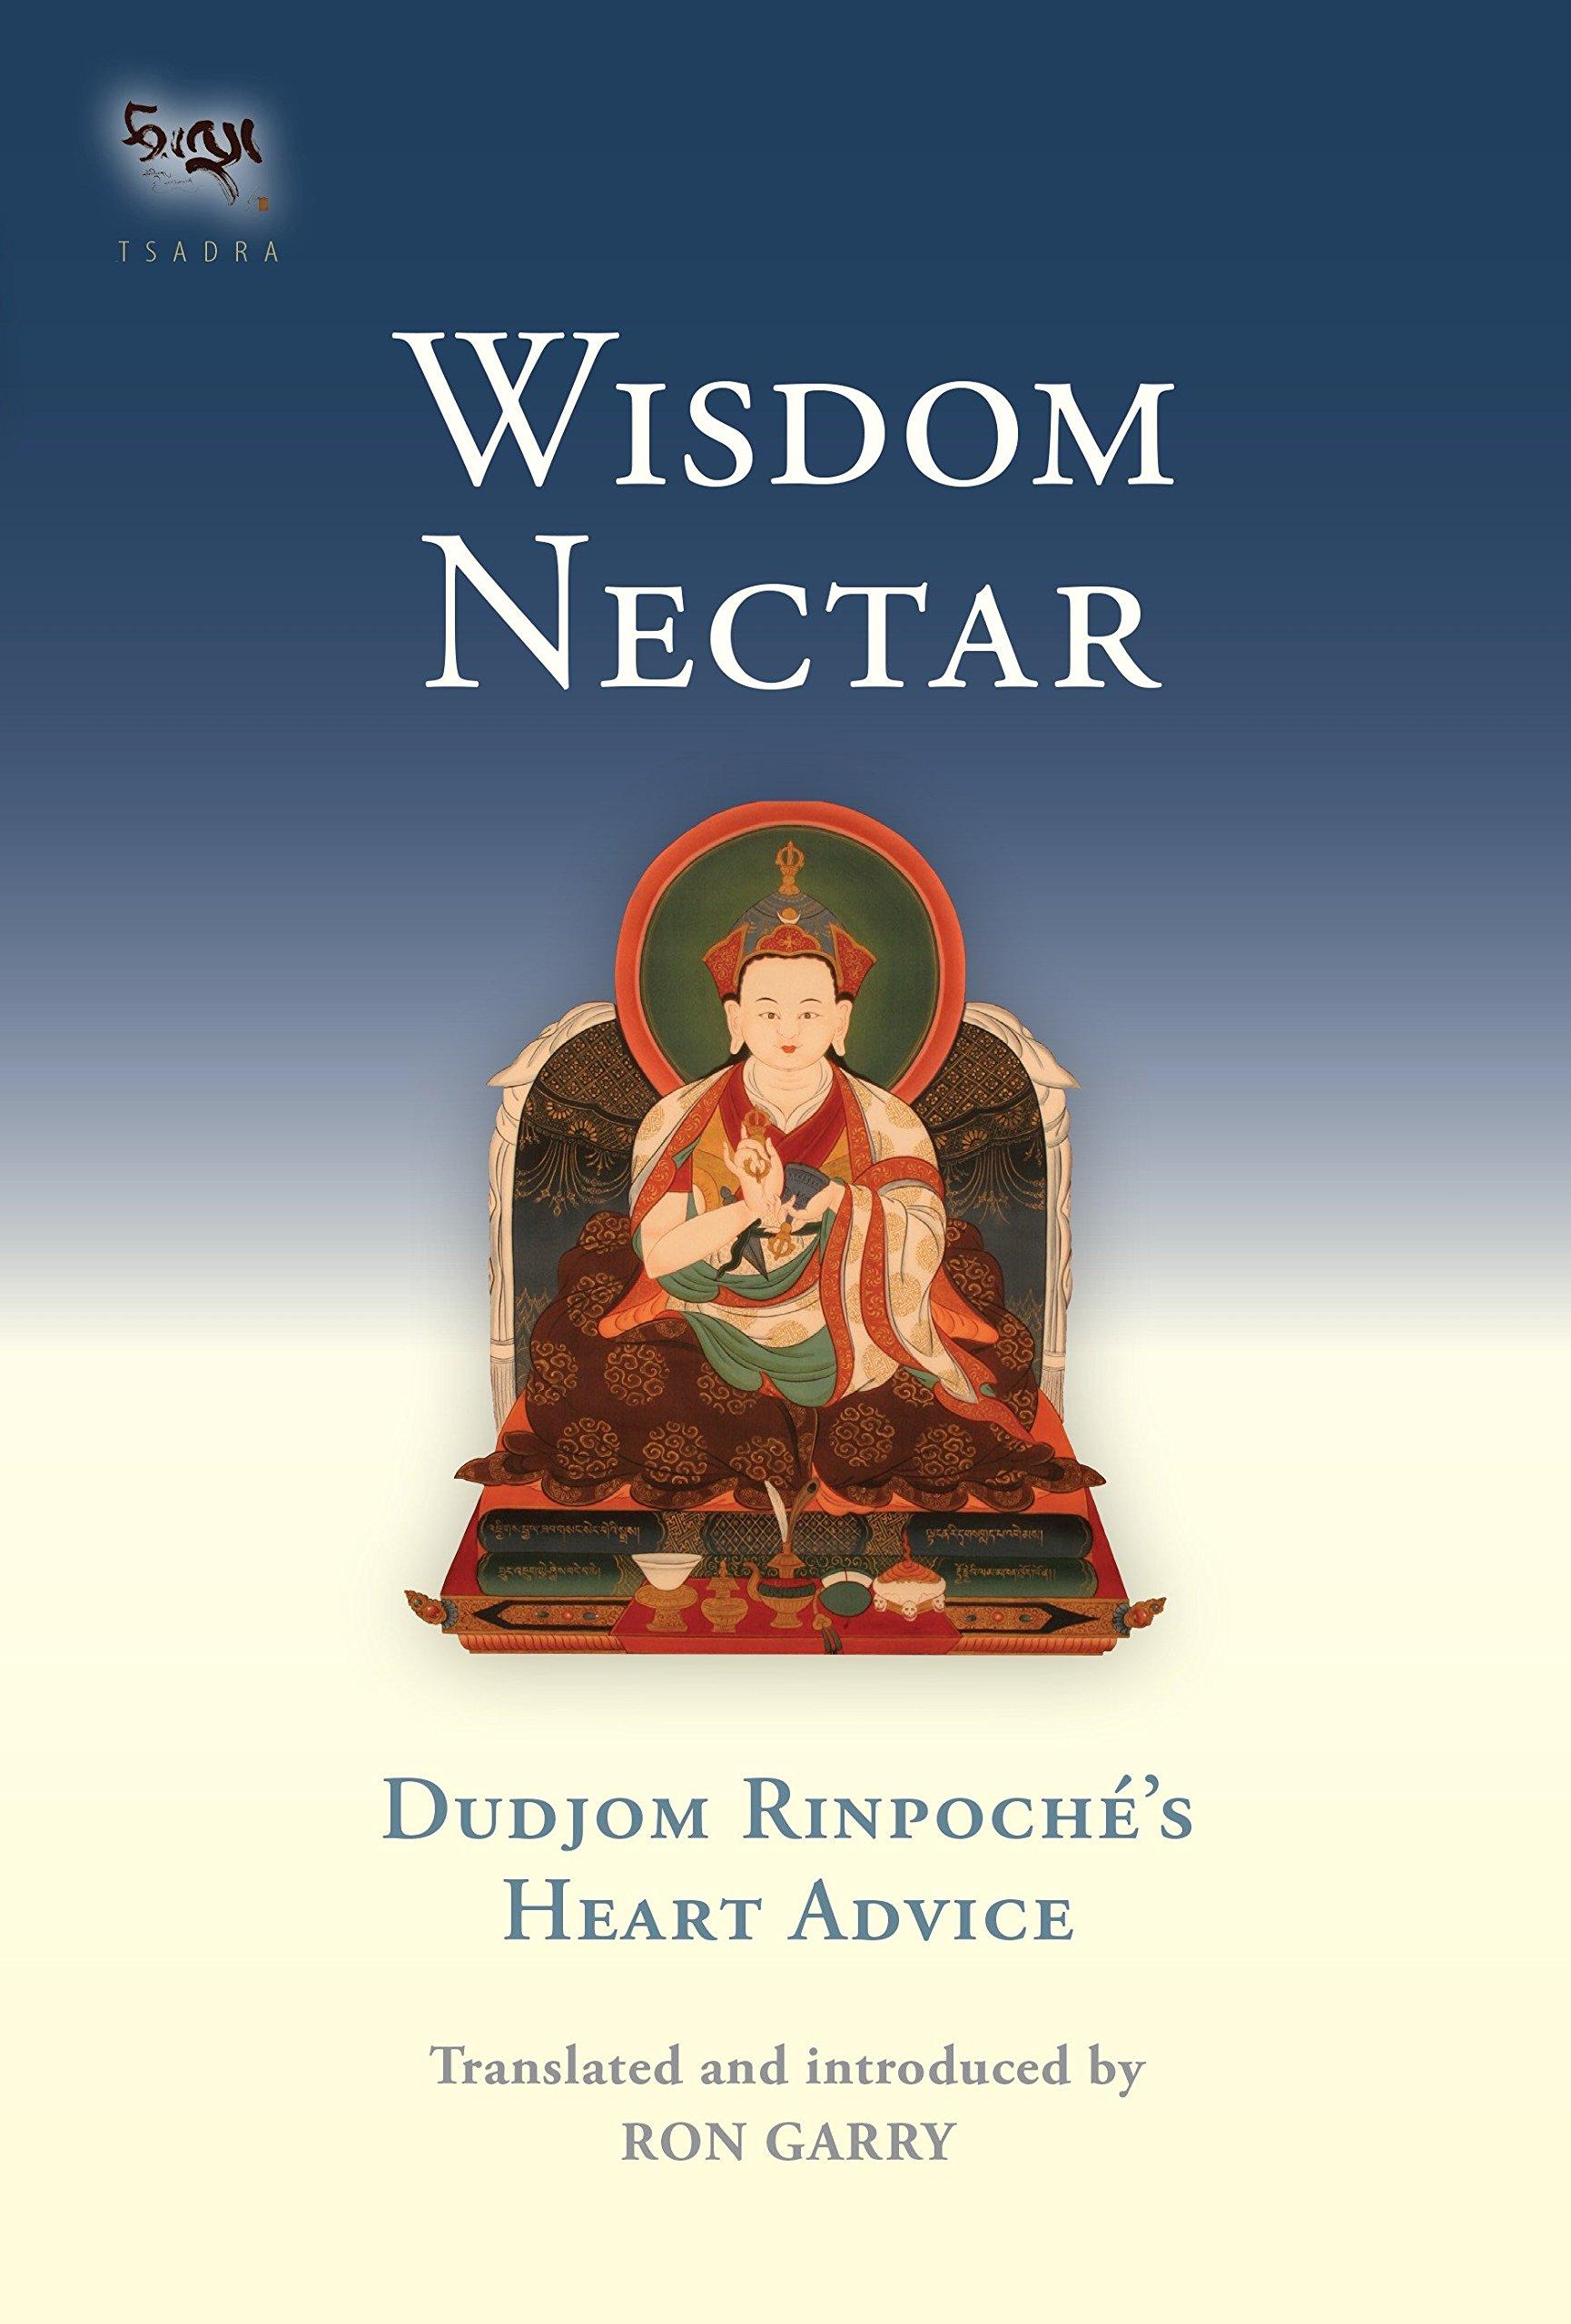 Dudjom Wisdom Nectar cover art